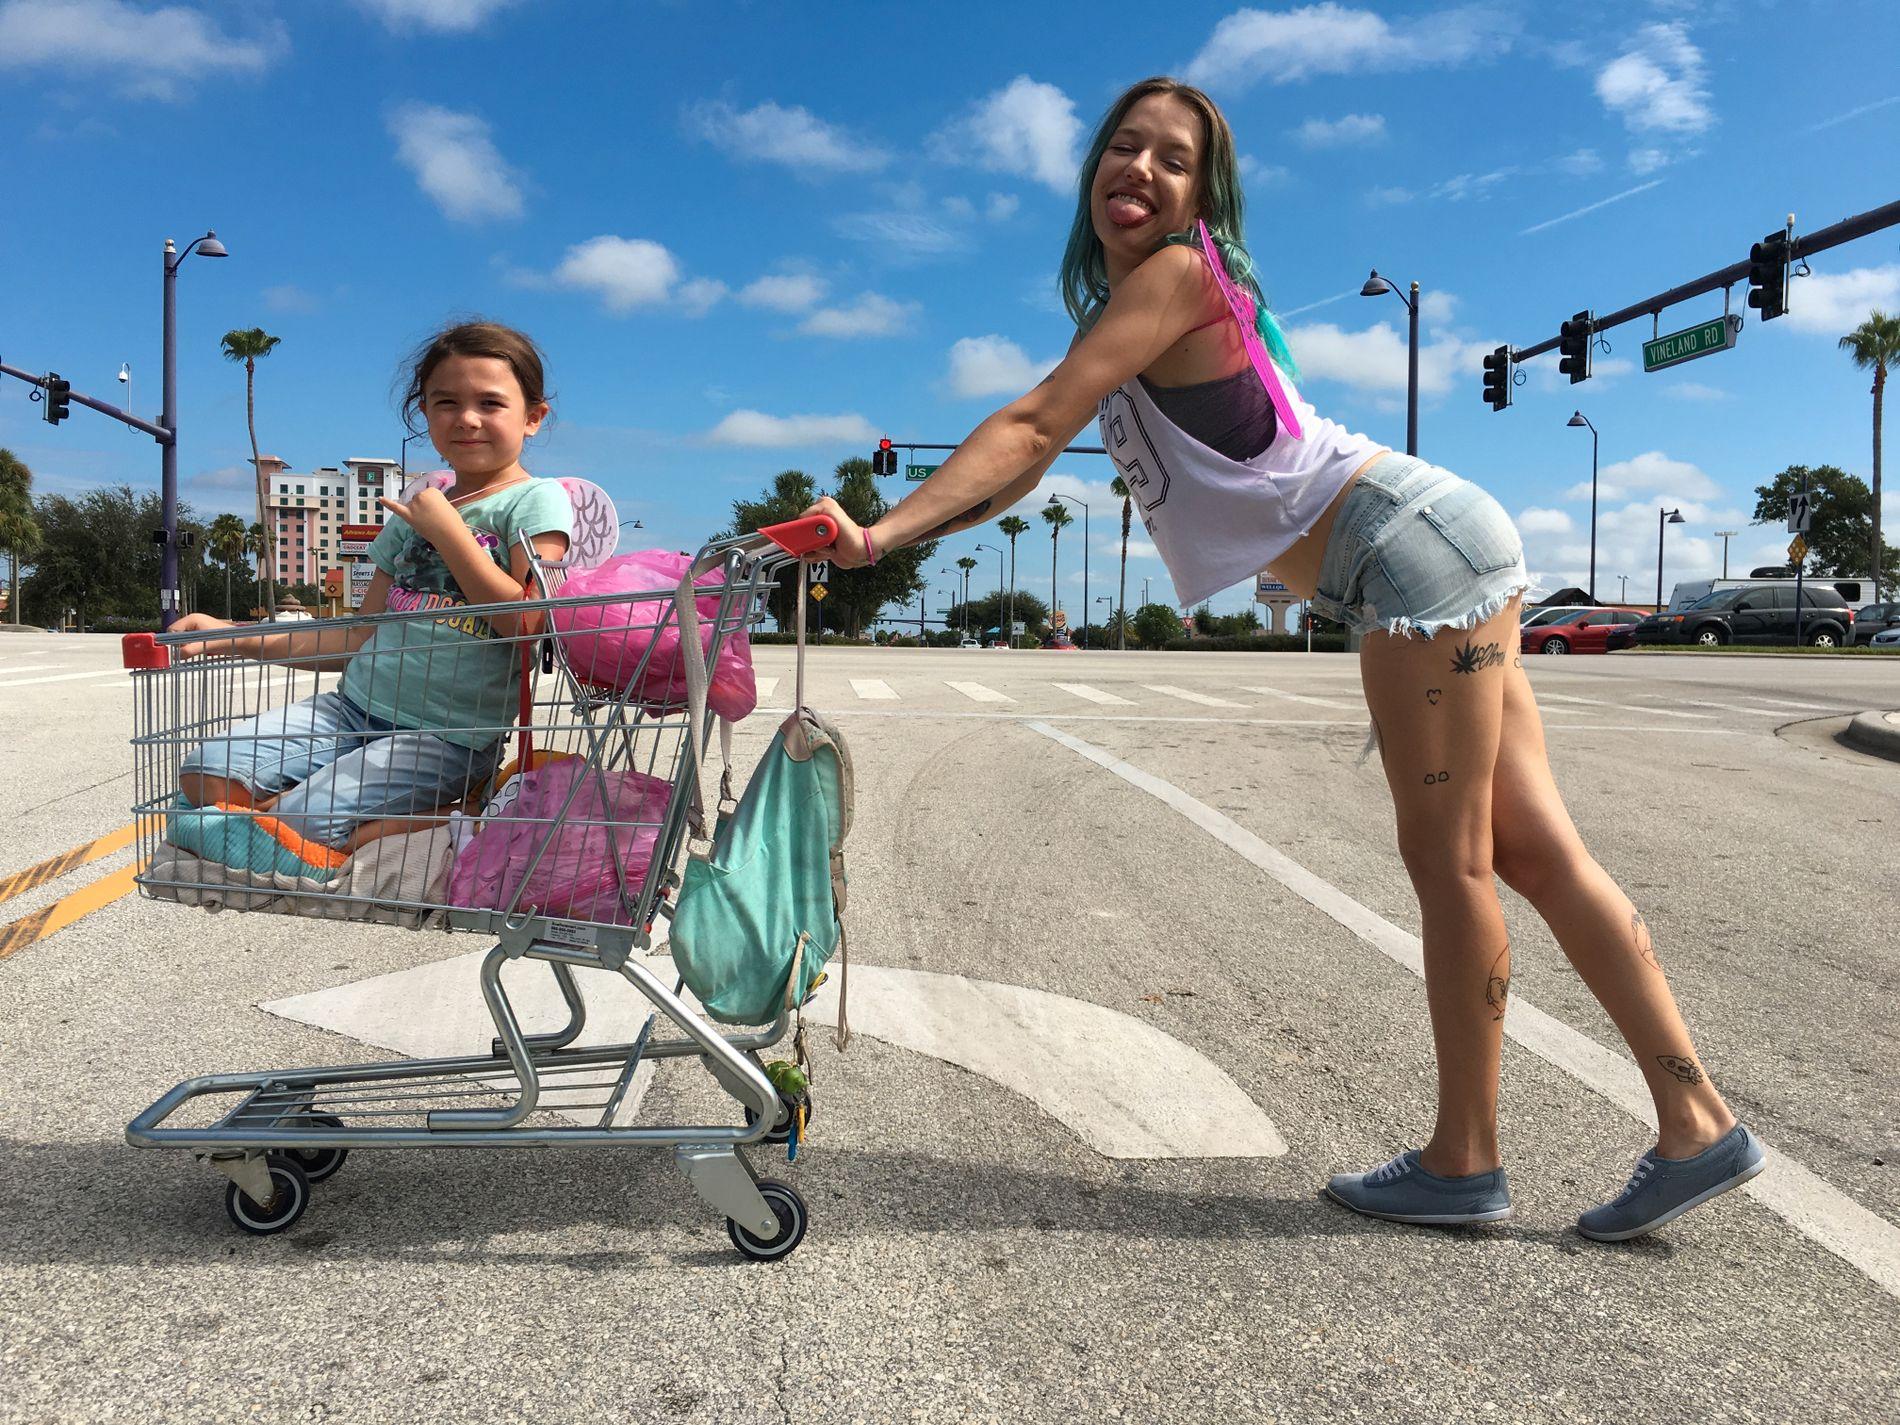 TIL HELVETE I EN HANDLEKURV?: Brooklynn Prince og Bria Vinaite i «The Florida Project».